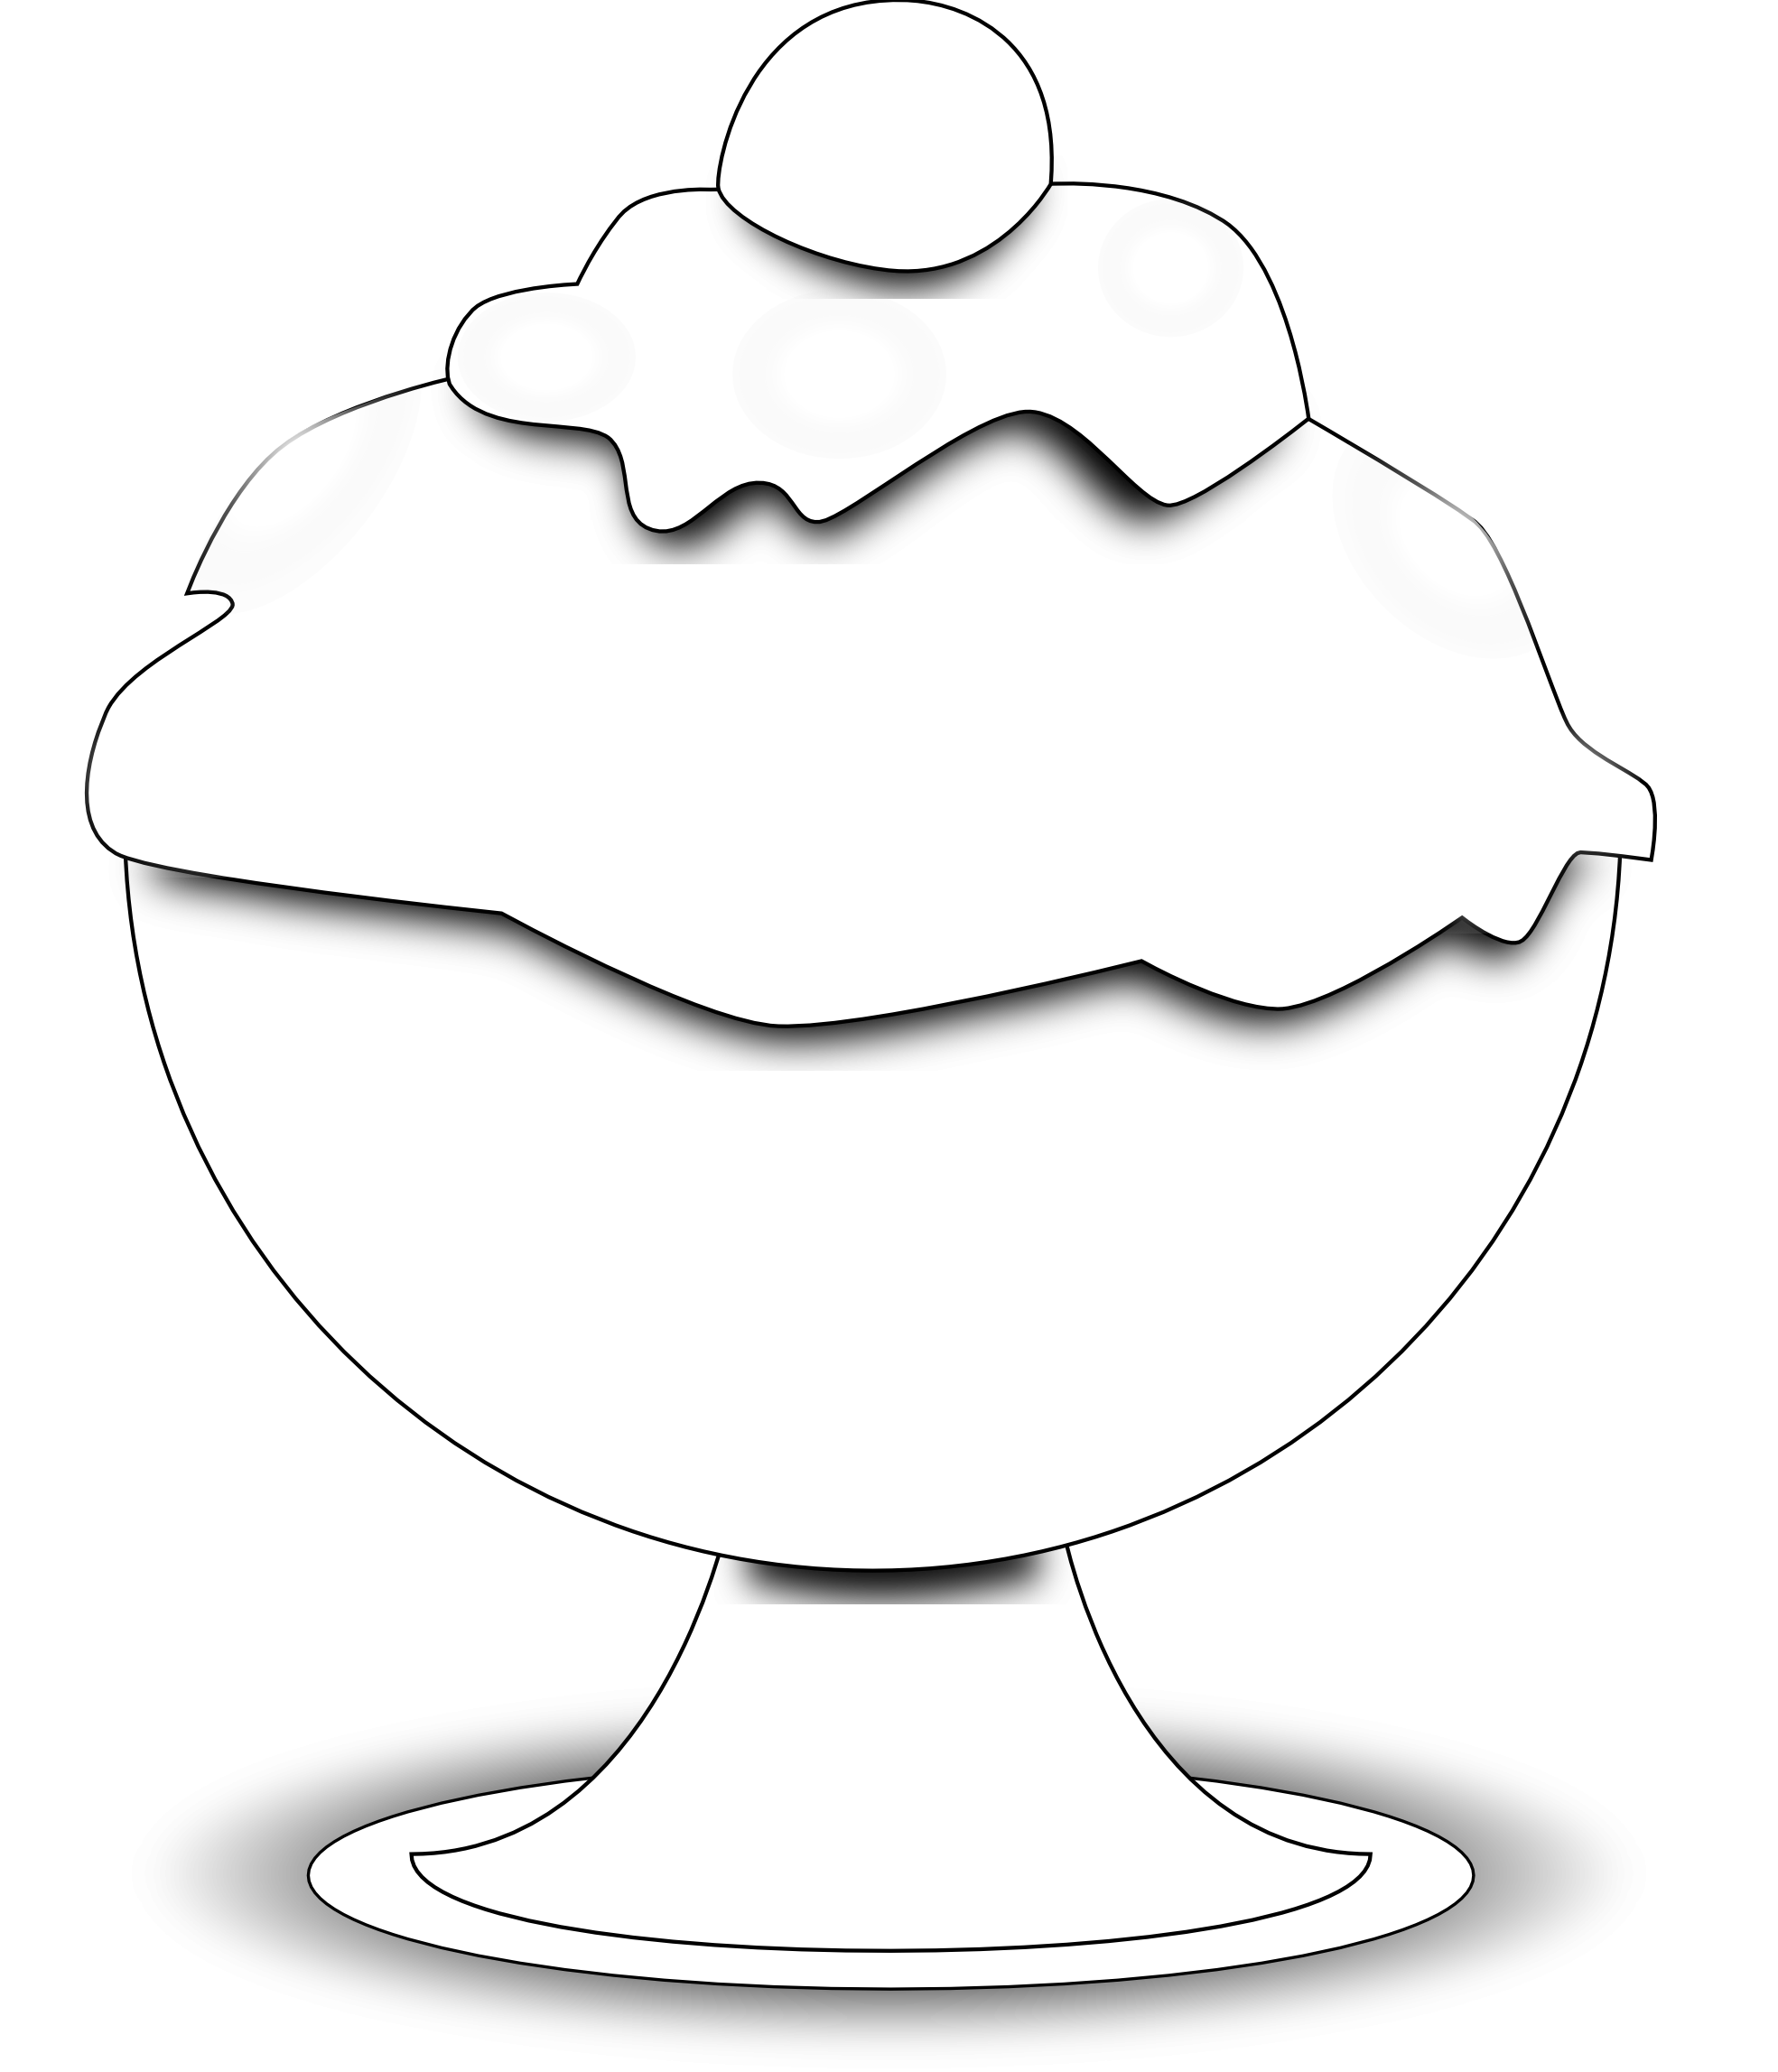 Food Ice Cream Black White | Clipart Panda - Free Clipart Images for Bowl Of Ice Cream Clipart Black And White  131fsj